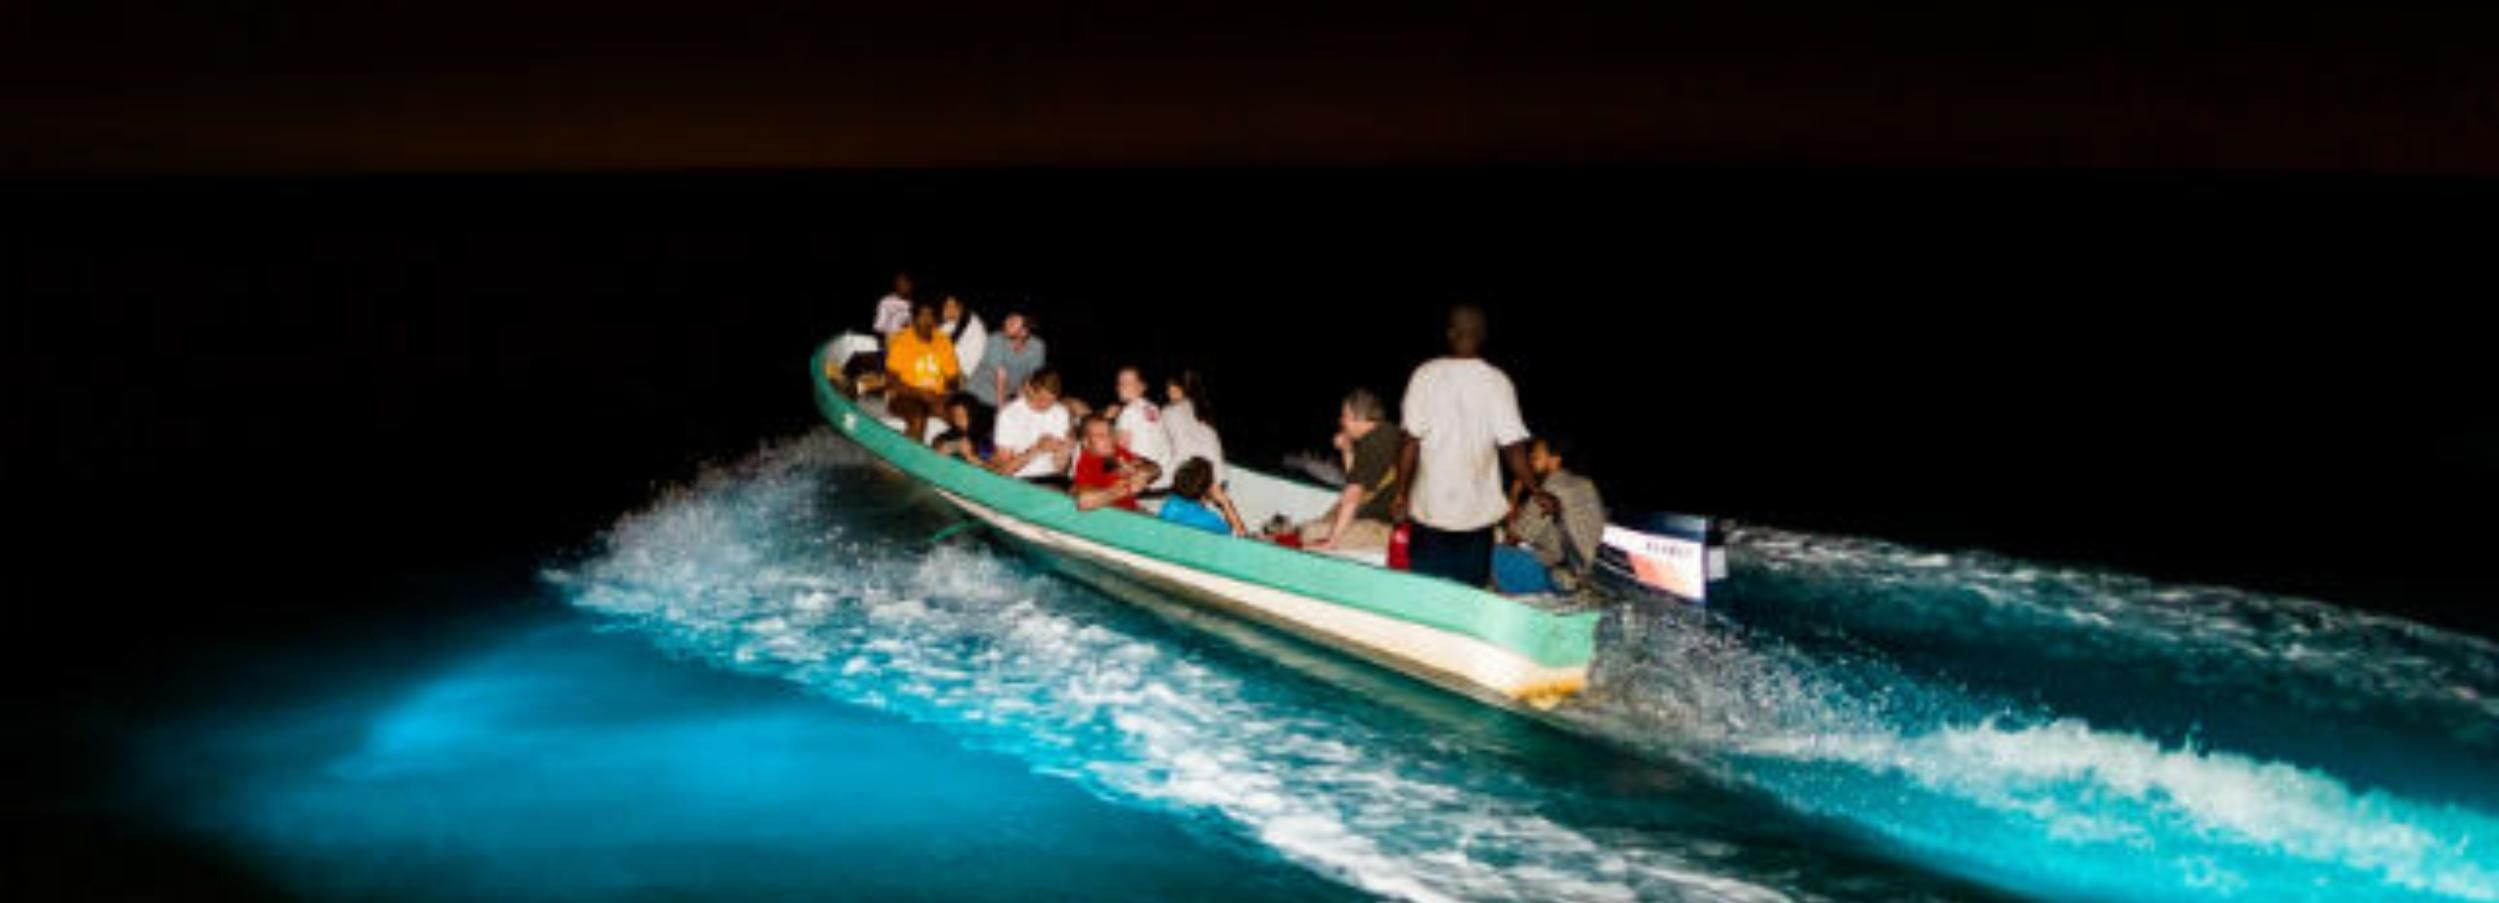 Puerto Escondido: Turtle Release and Bioluminescent Plankton